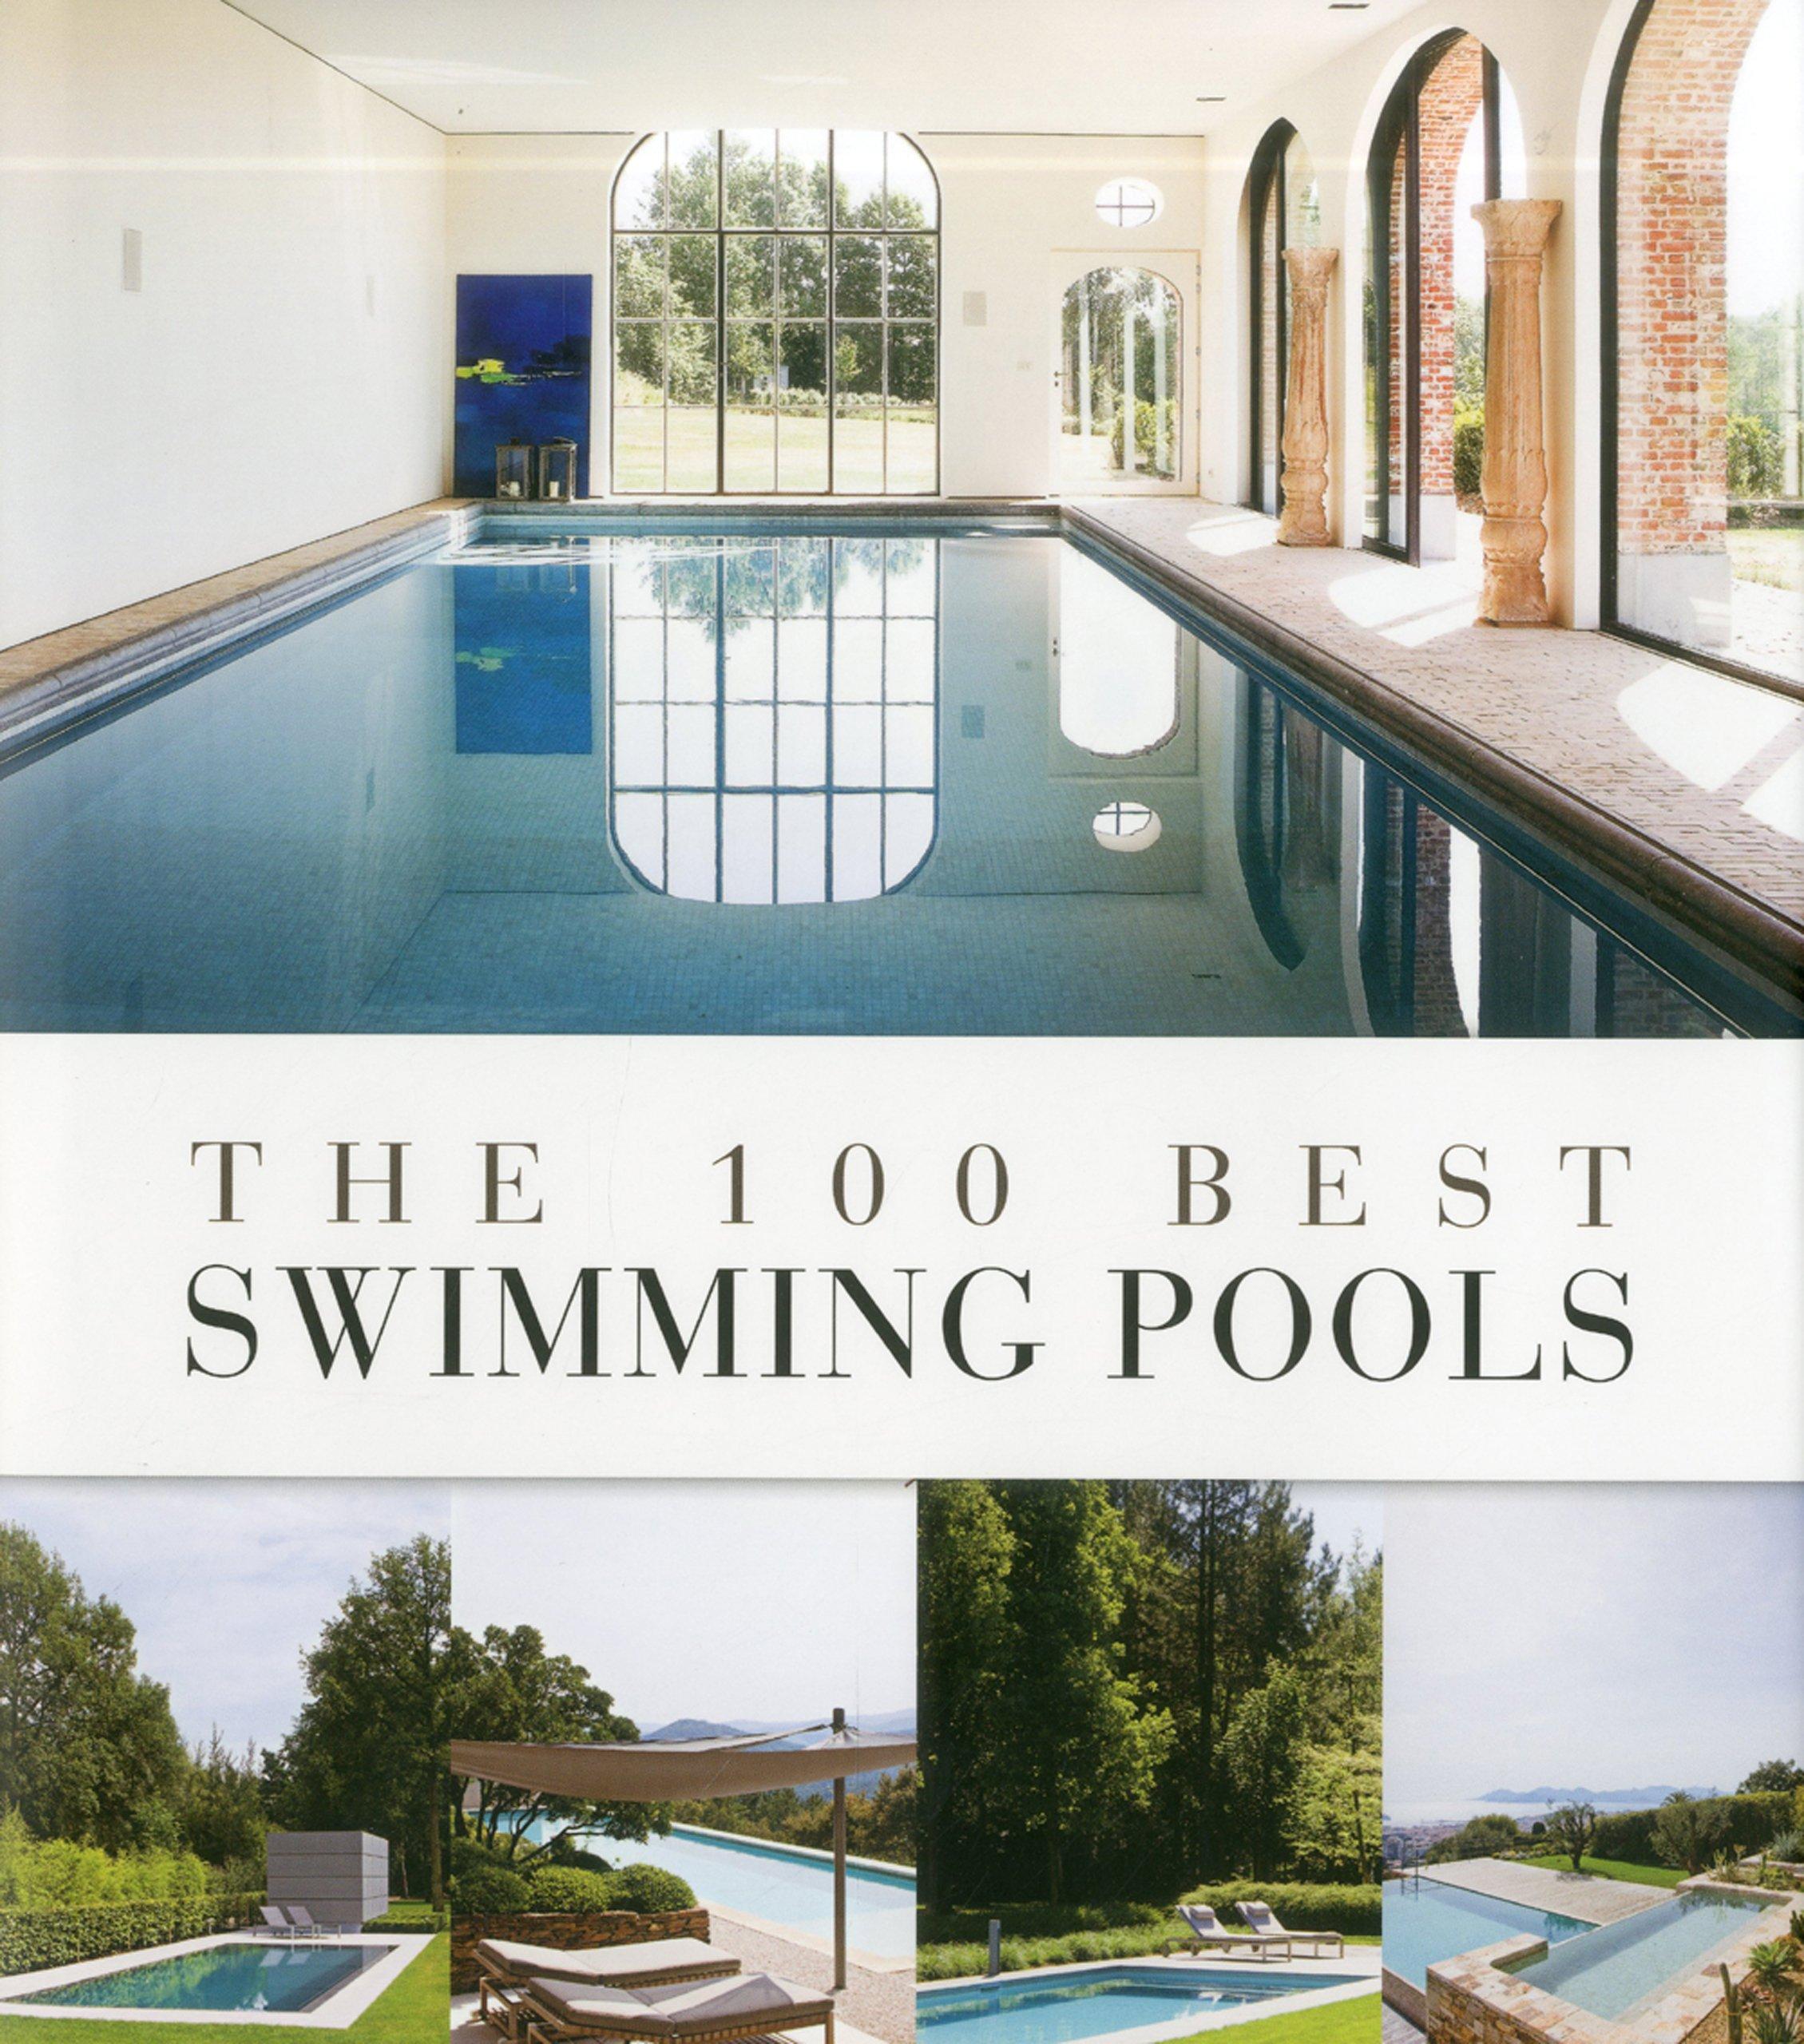 Amazon.com: The 100 Best Swimming Pools (9789089441201): Wim Pauwels ...